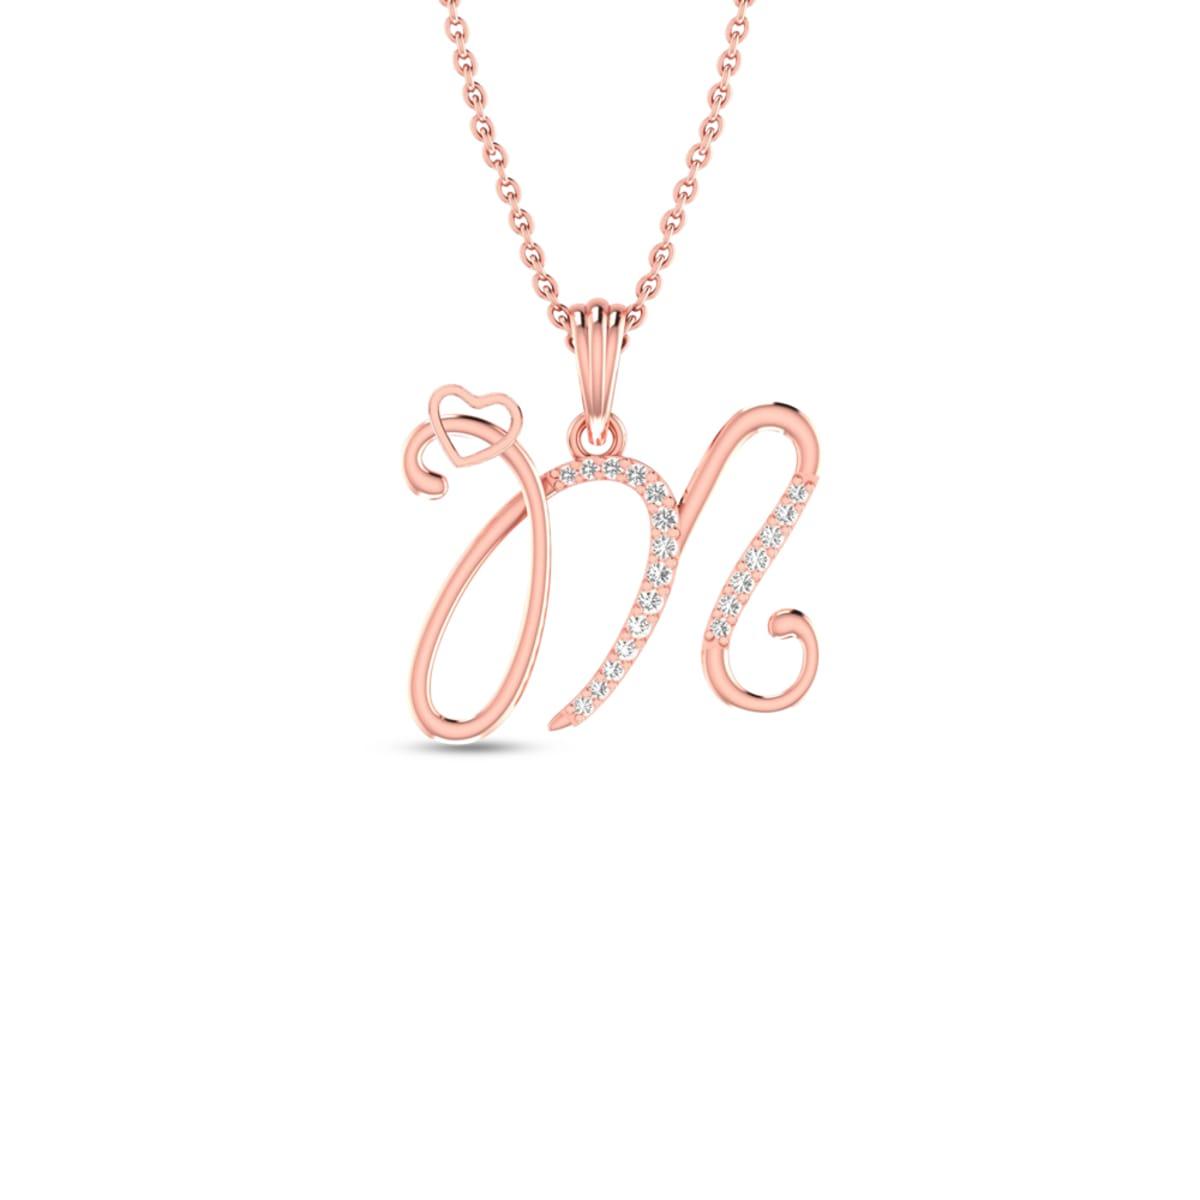 M Letter Real Diamond Pendant